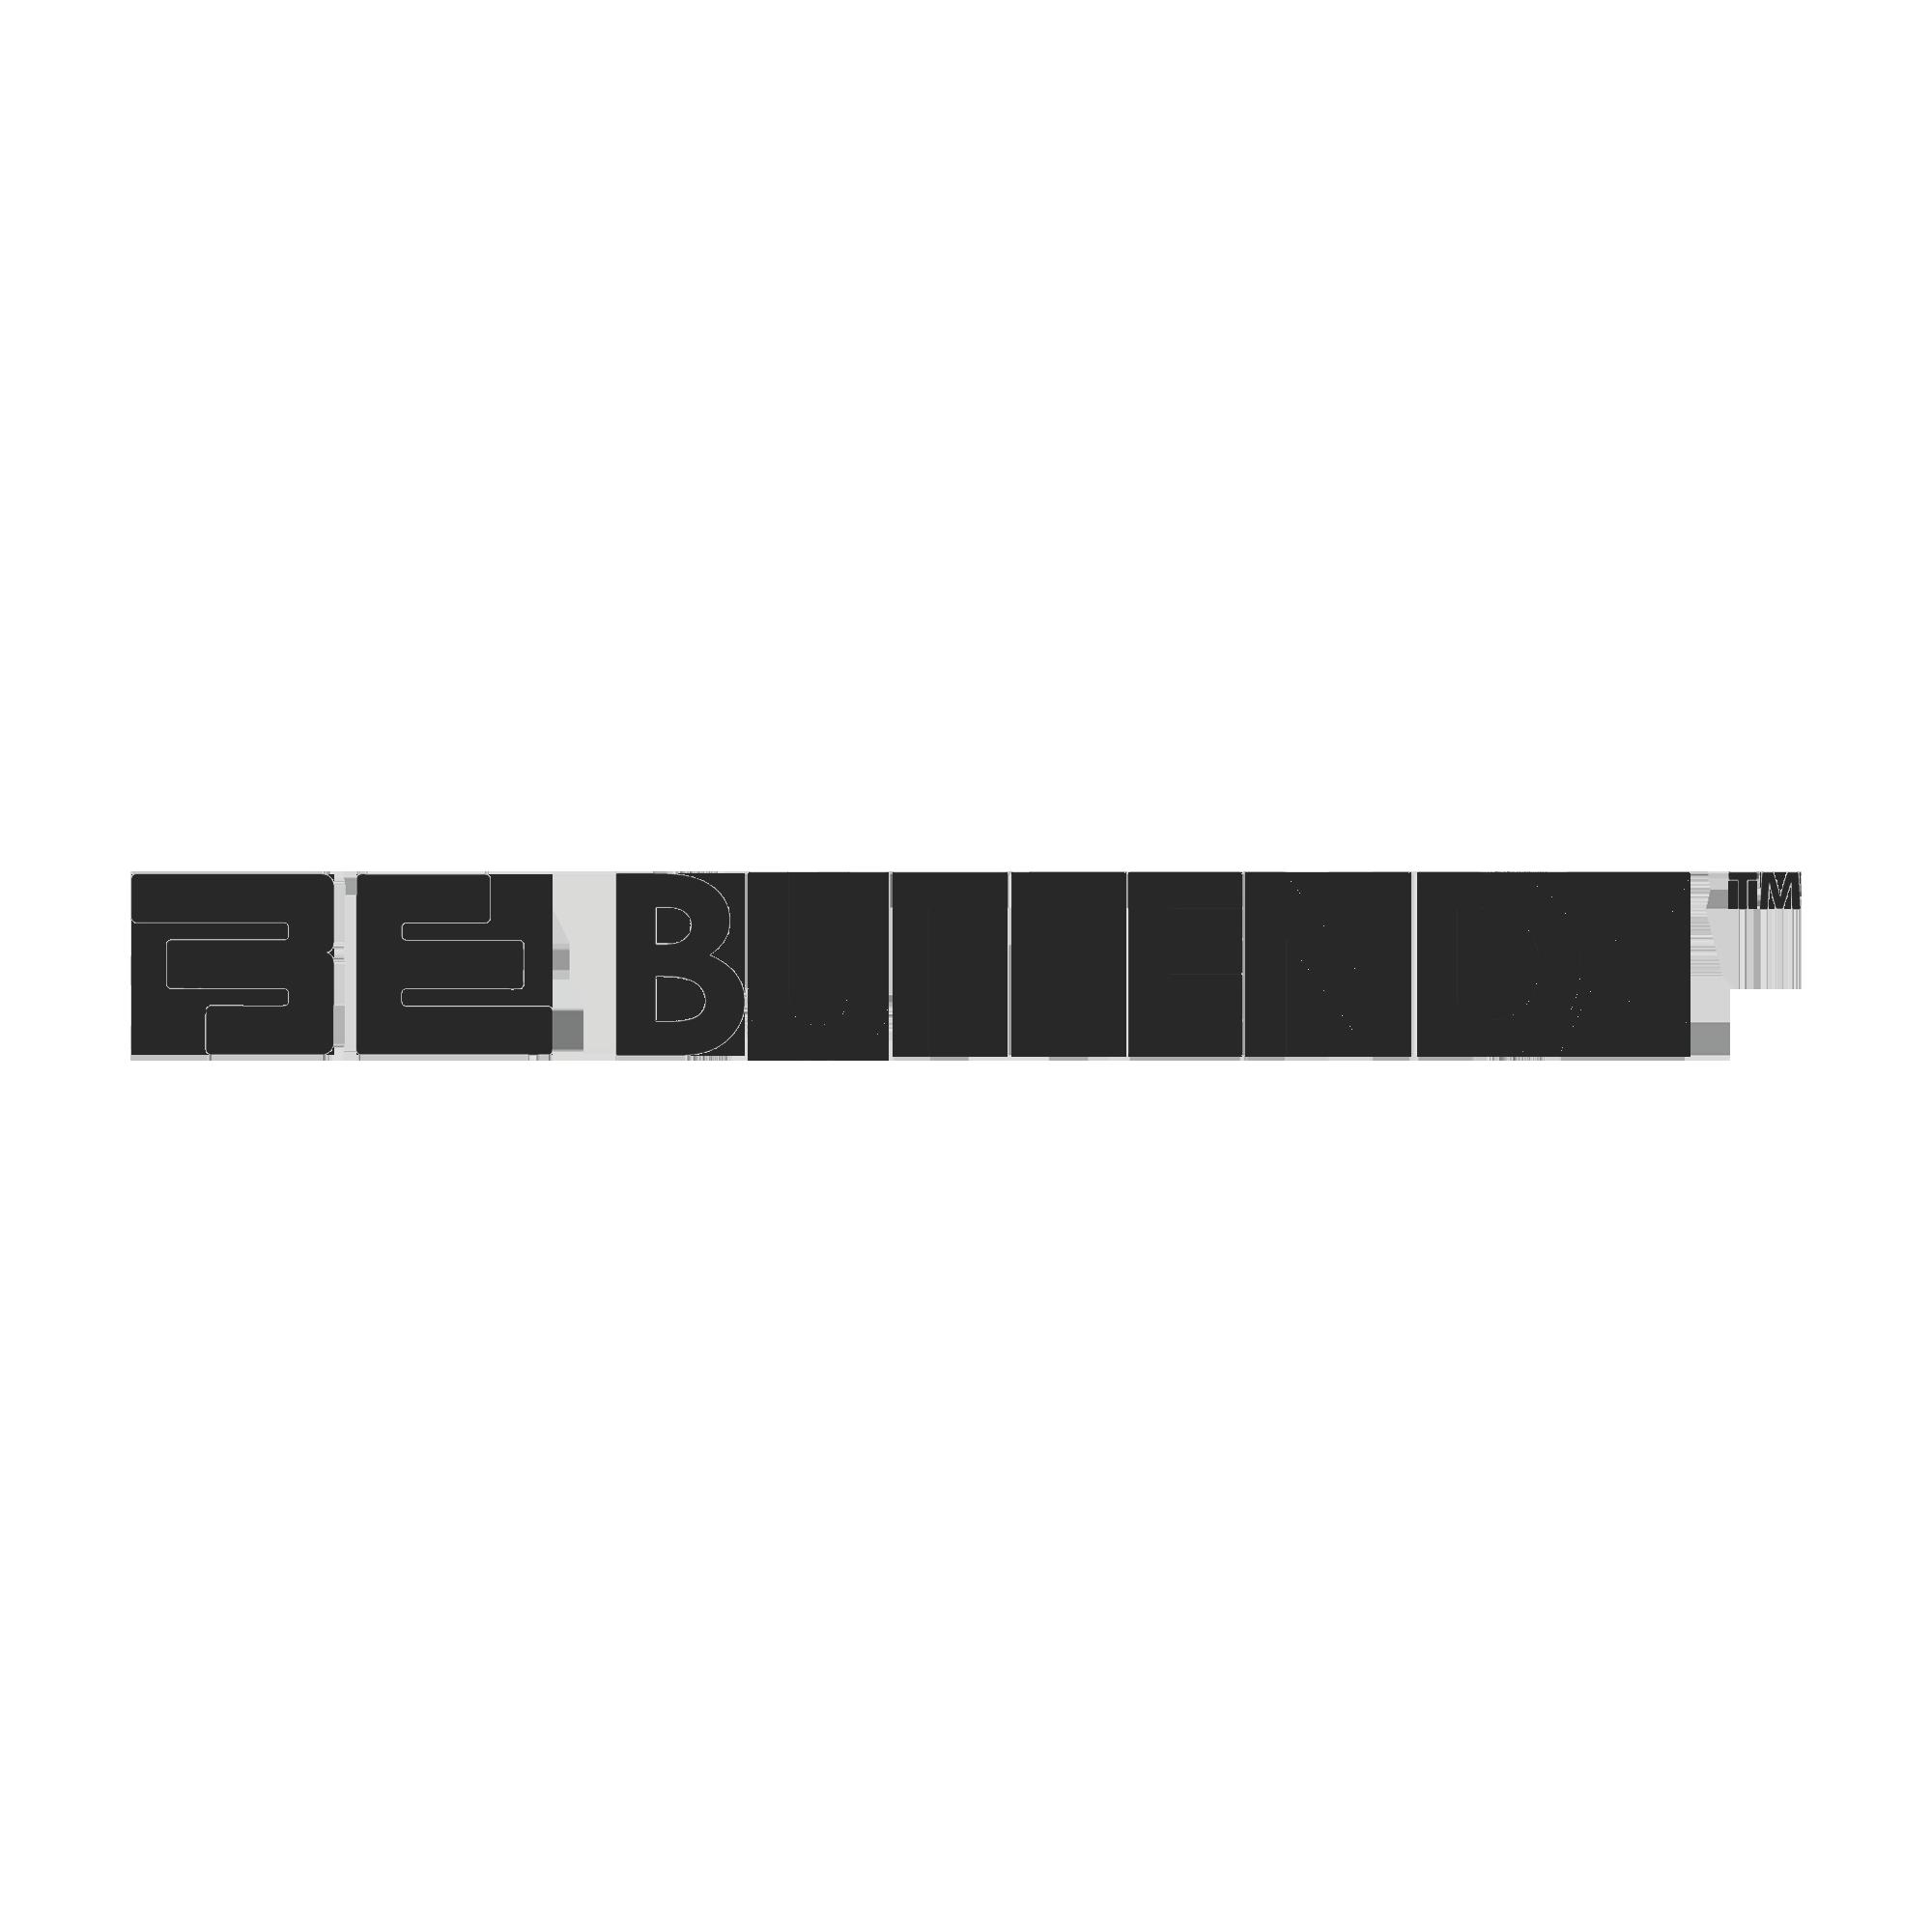 18_Buttendz_GREY.png